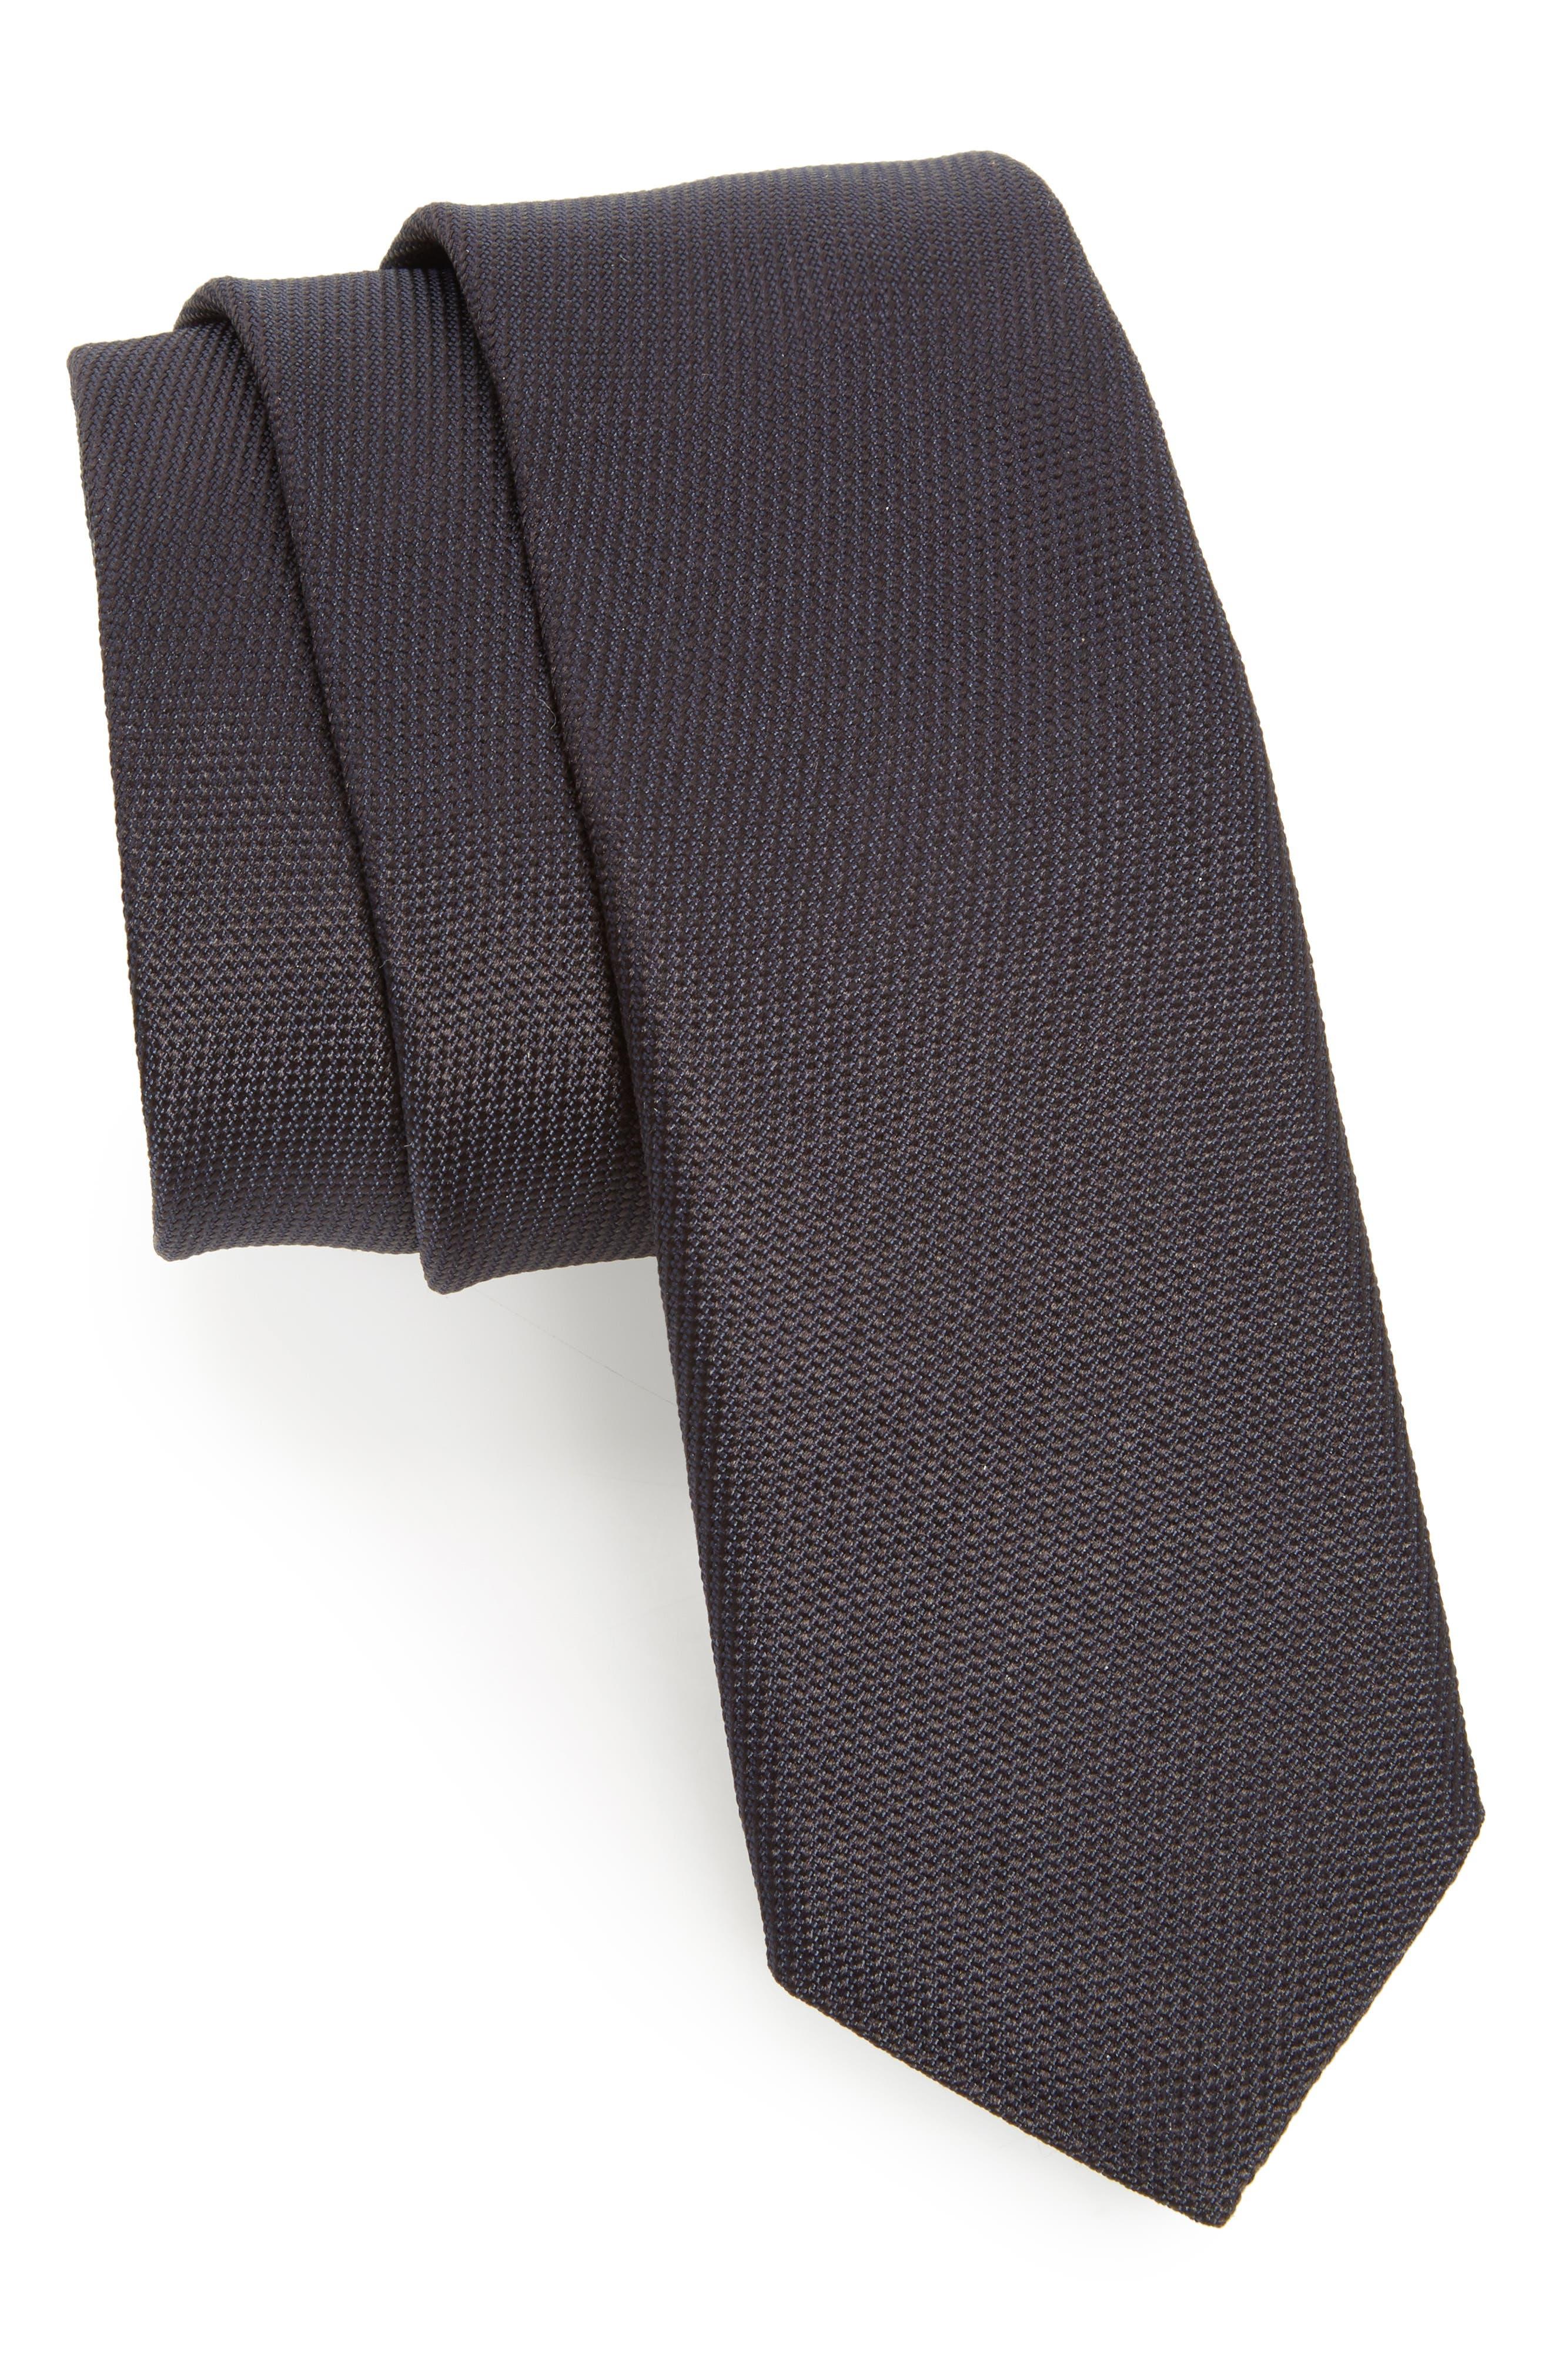 Nordstrom x BOSS Silk Tie,                         Main,                         color, Blue